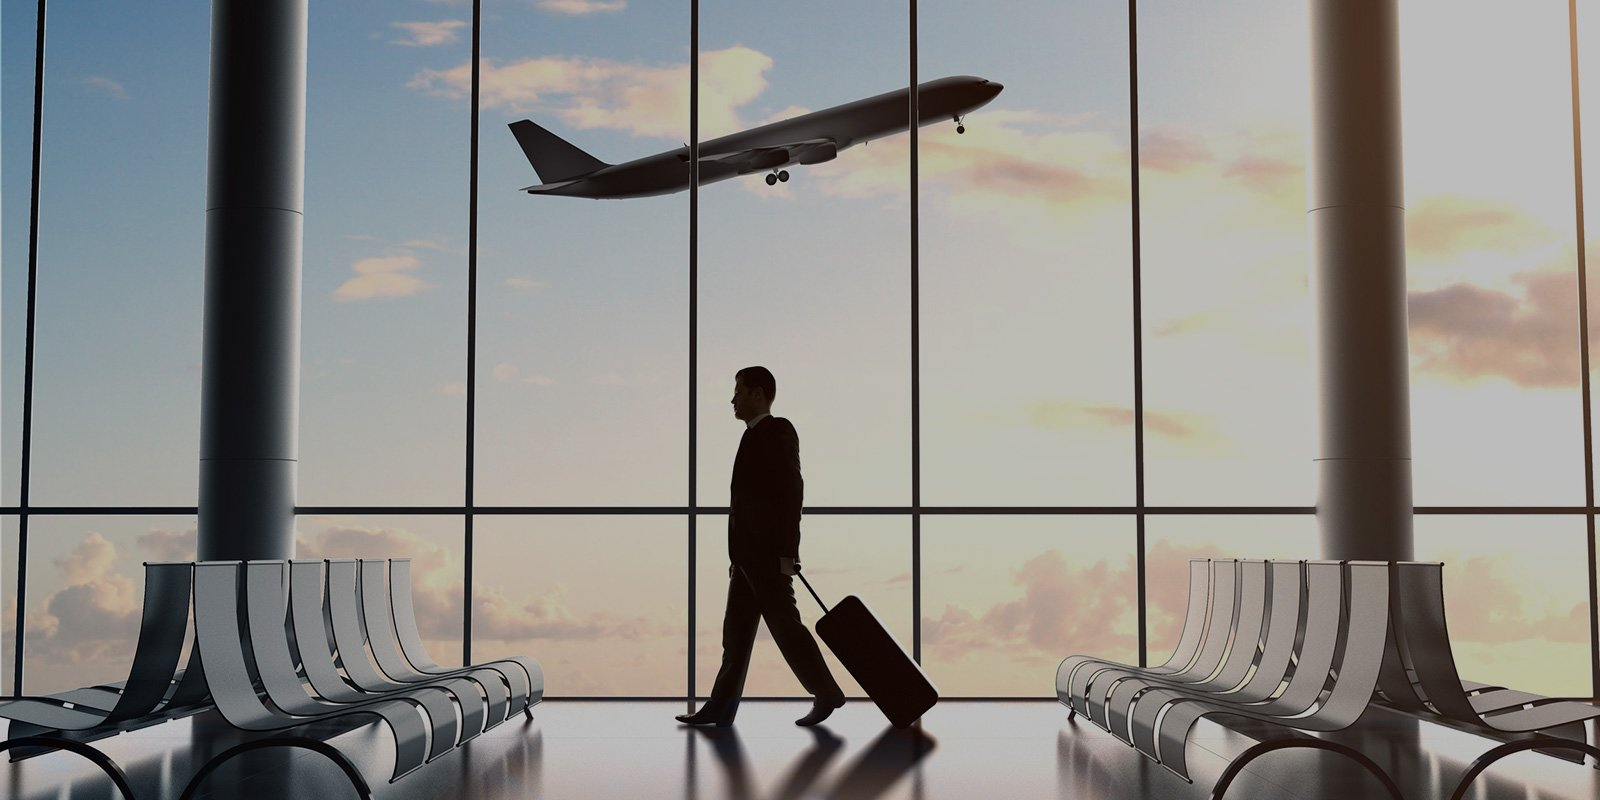 CATANIA AIRPORT MERCEDES BENZ FLEET